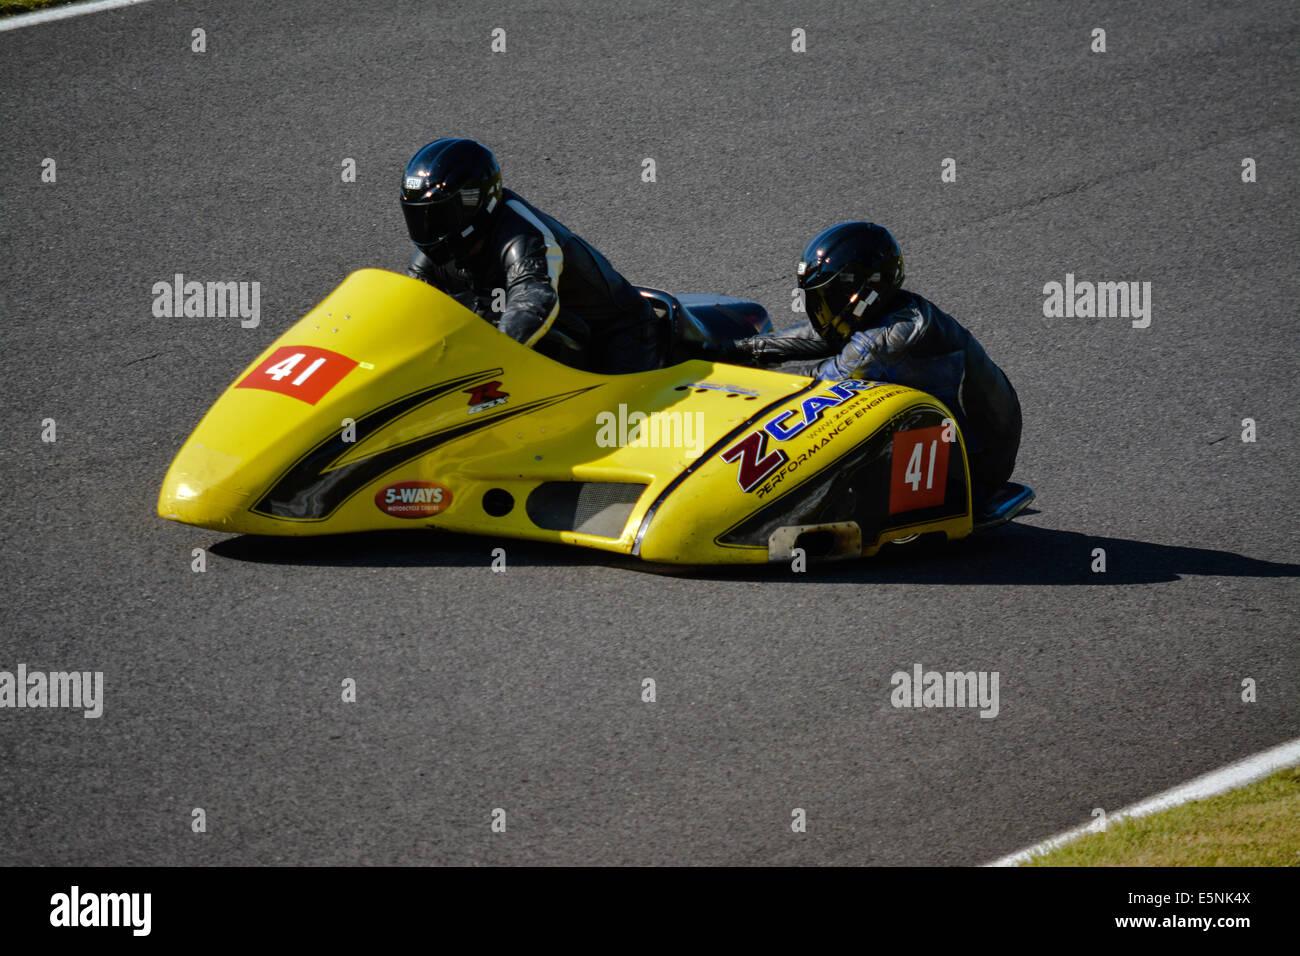 Racing Sidecar Stock Photos Images Alamy Tt2011 Sidecars Image